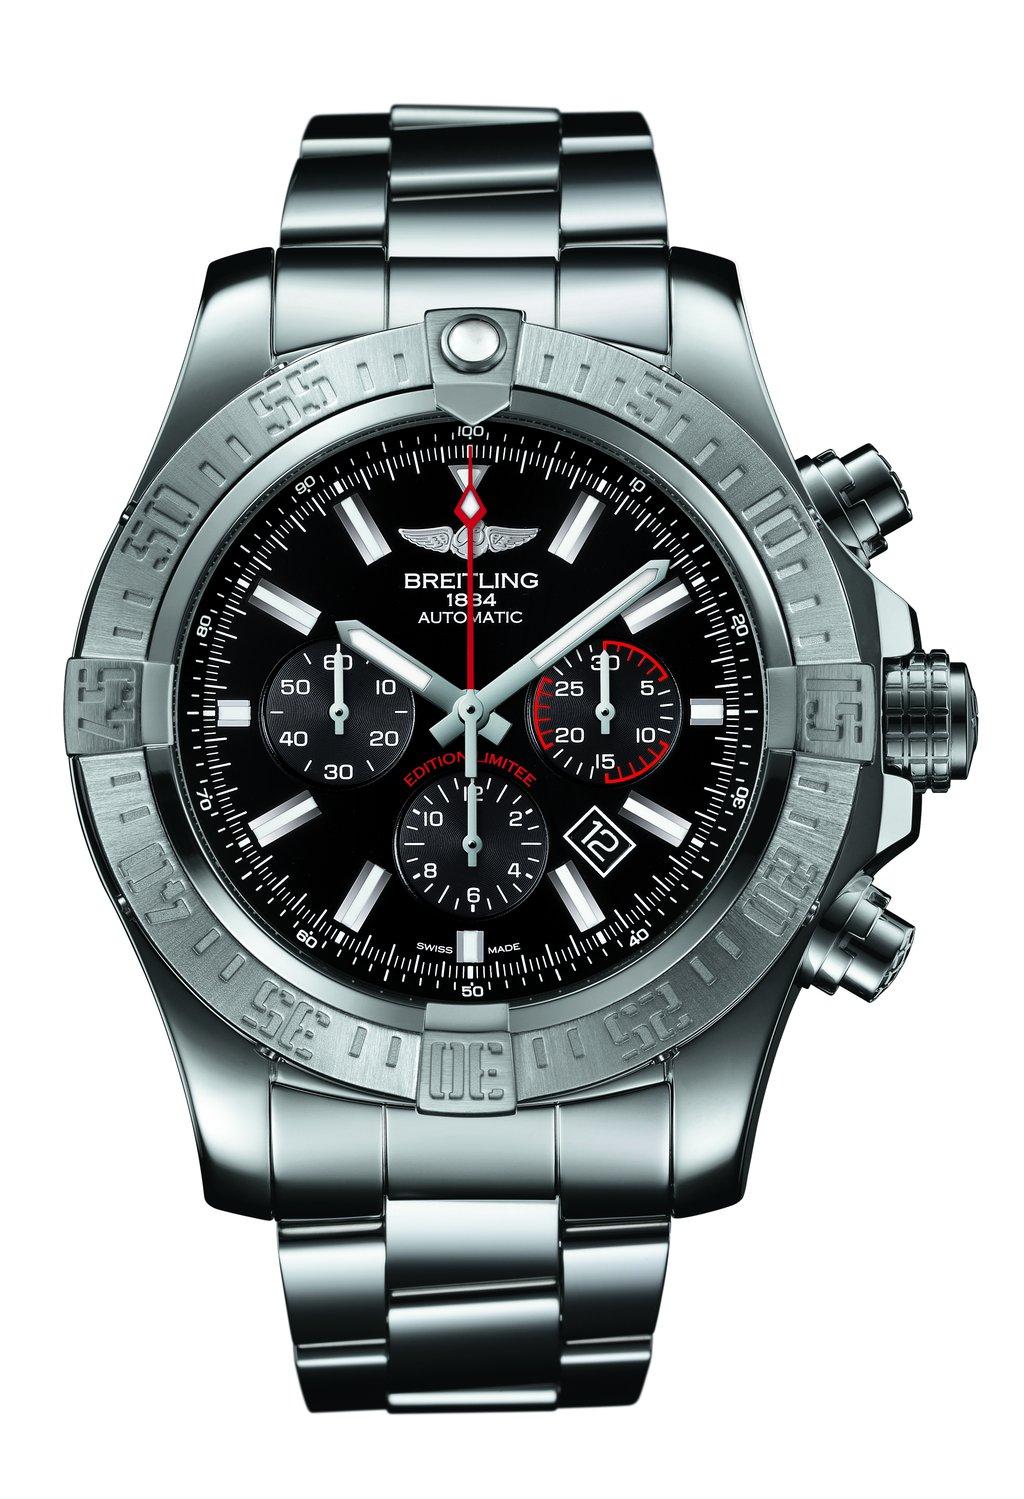 Breitling-Super-Avenger-01-Boutique-Edition-12.jpg